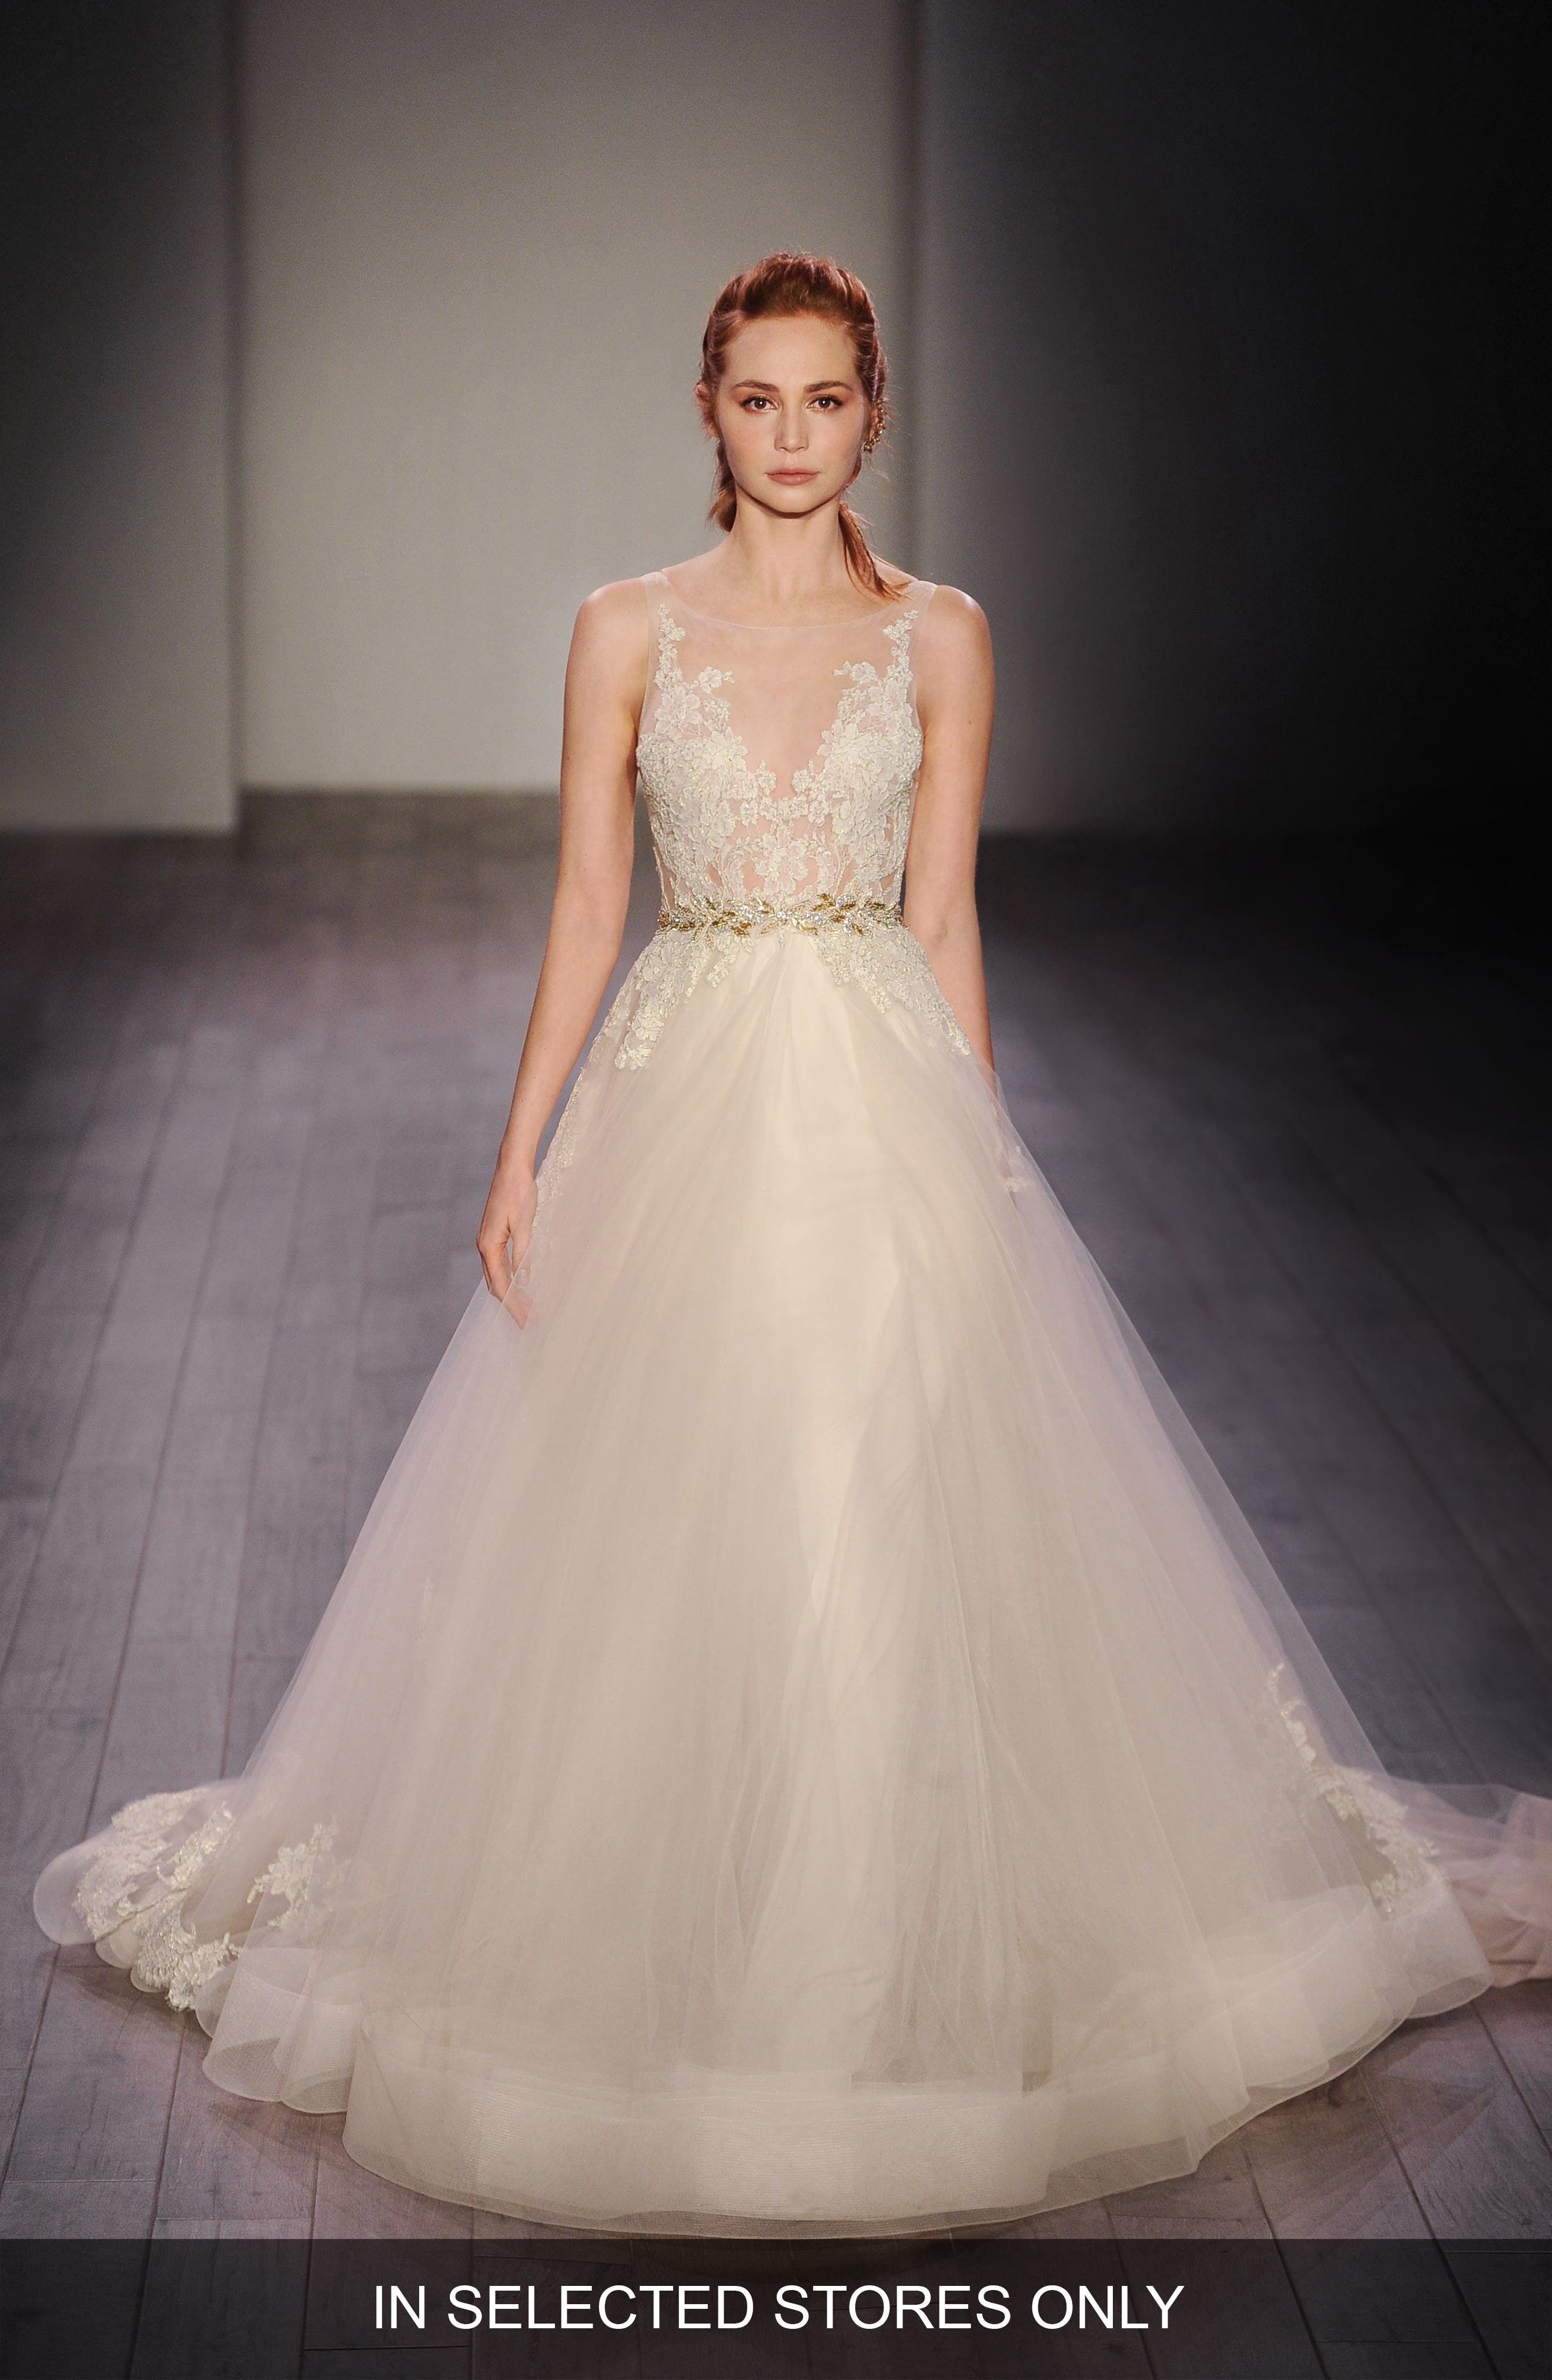 Alternate Image 1 Selected - Lazaro Lace Appliqué Tulle Ballgown Dress